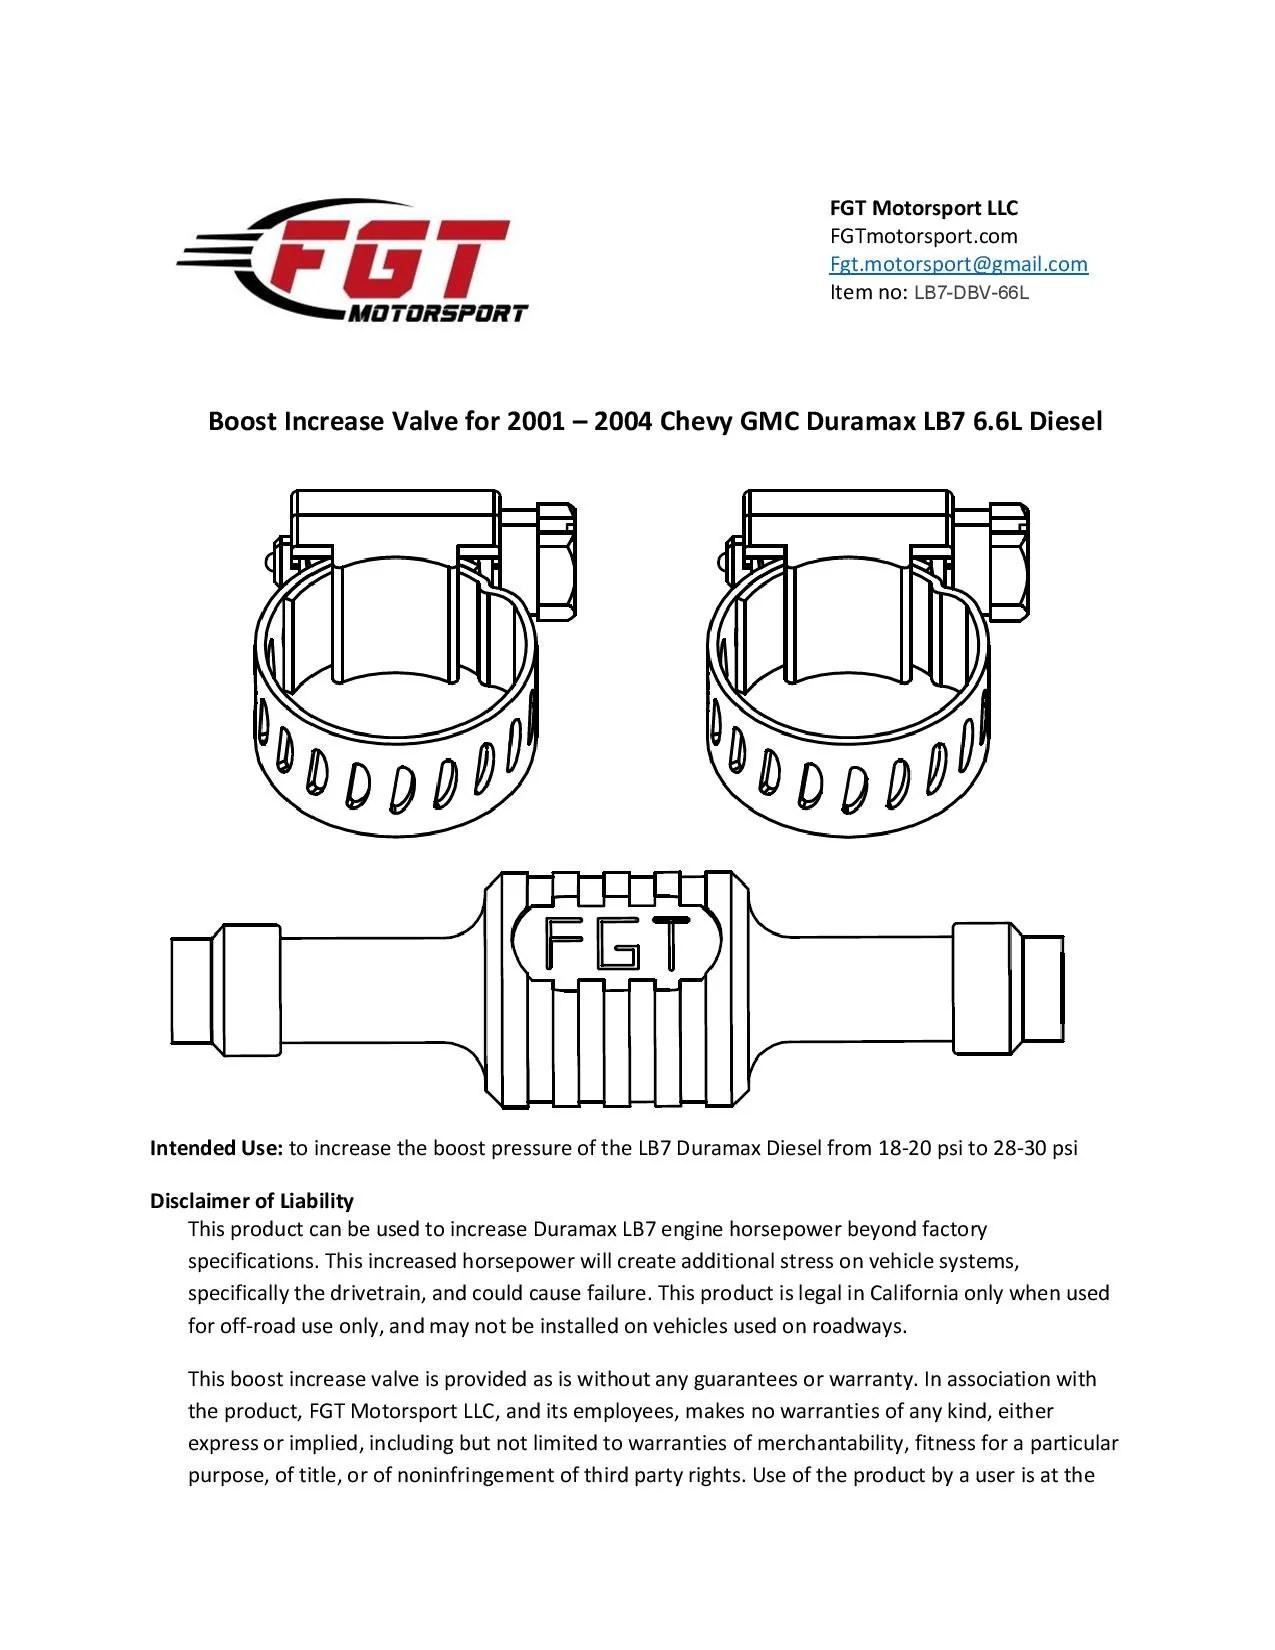 boost increase valve for 01 04 duramax 6 6l lb7 chevy silverado [ 1275 x 1650 Pixel ]